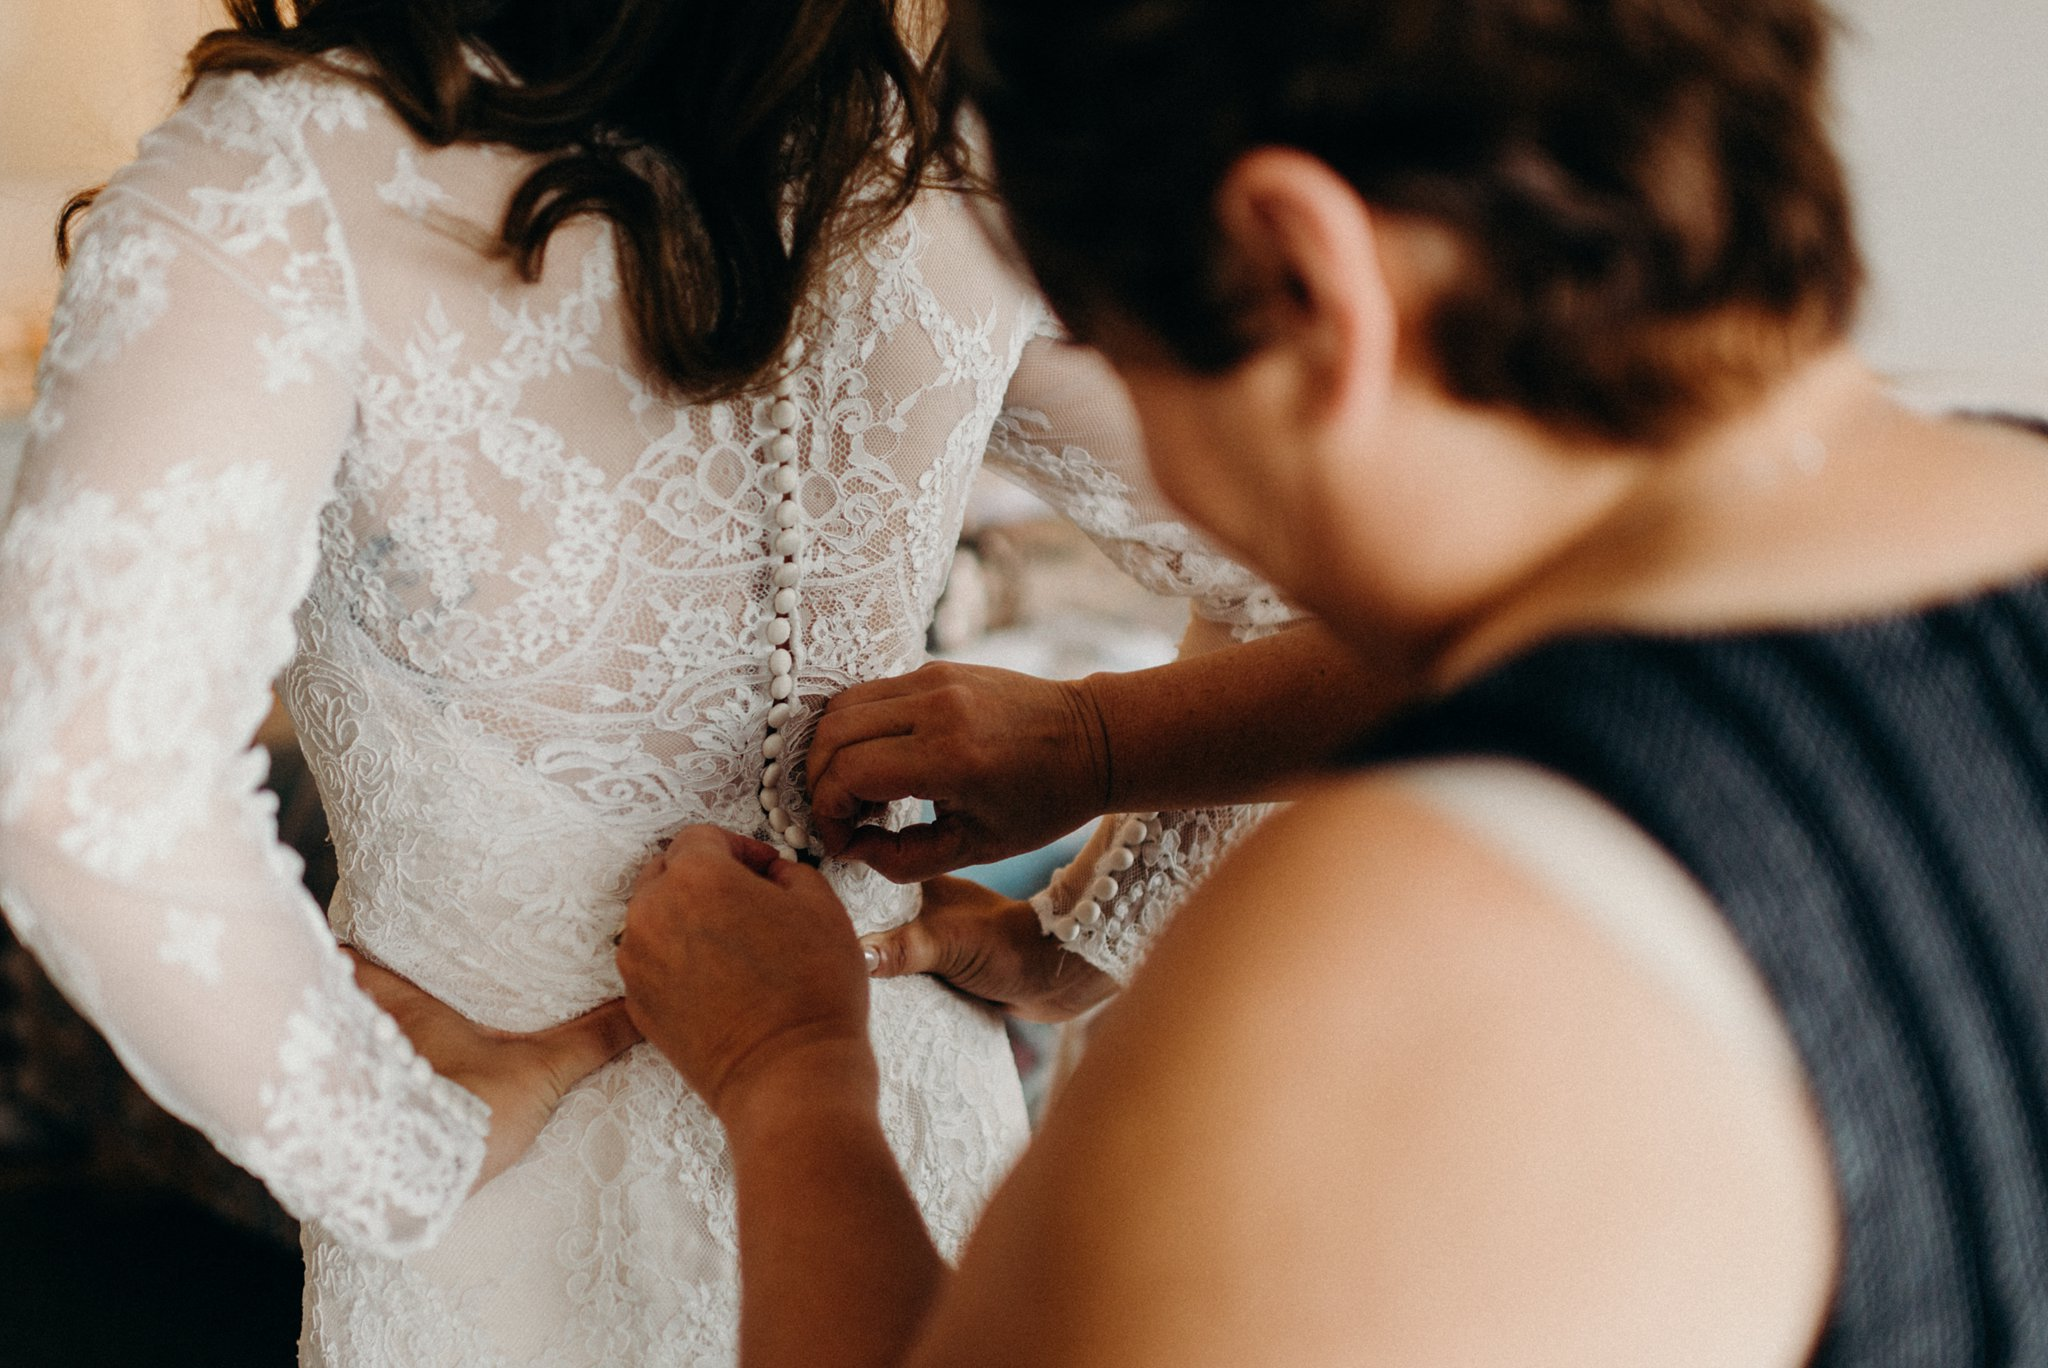 kaihla_tonai_intimate_wedding_elopement_photographer_6703.jpg